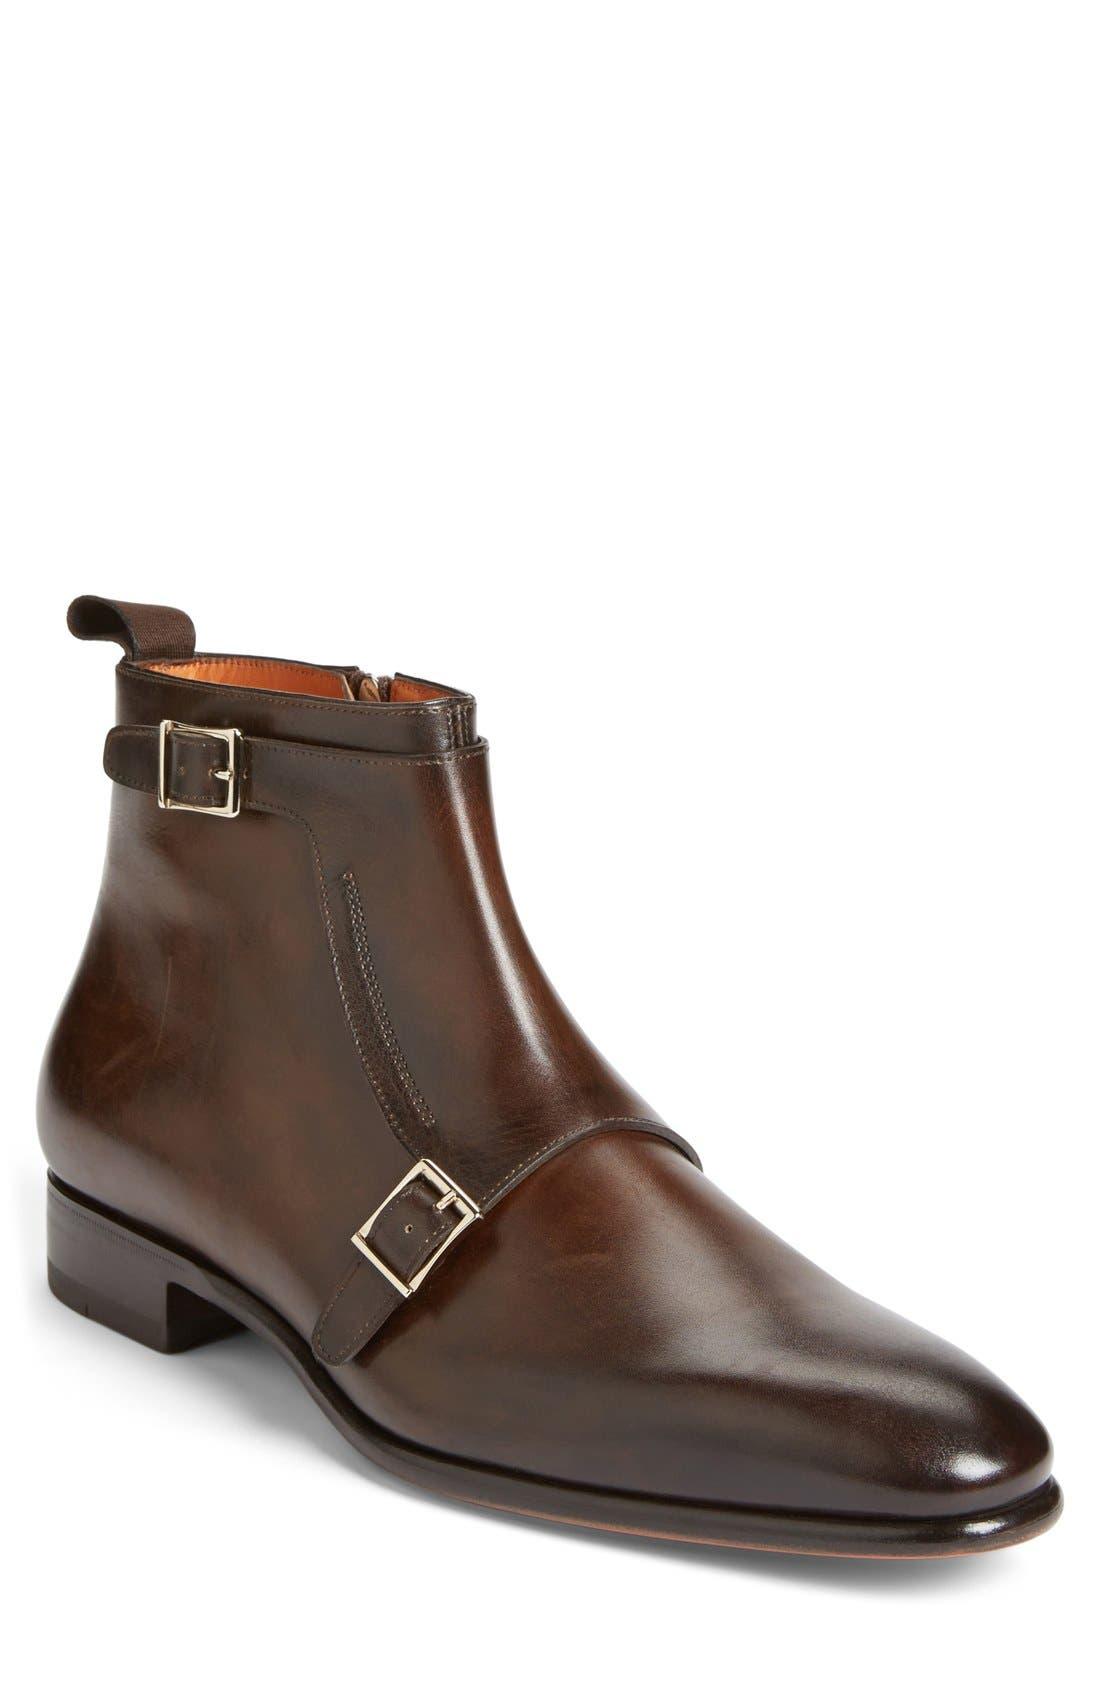 Alternate Image 1 Selected - Santoni 'Ciro' Double Monk Strap Boot(Men)